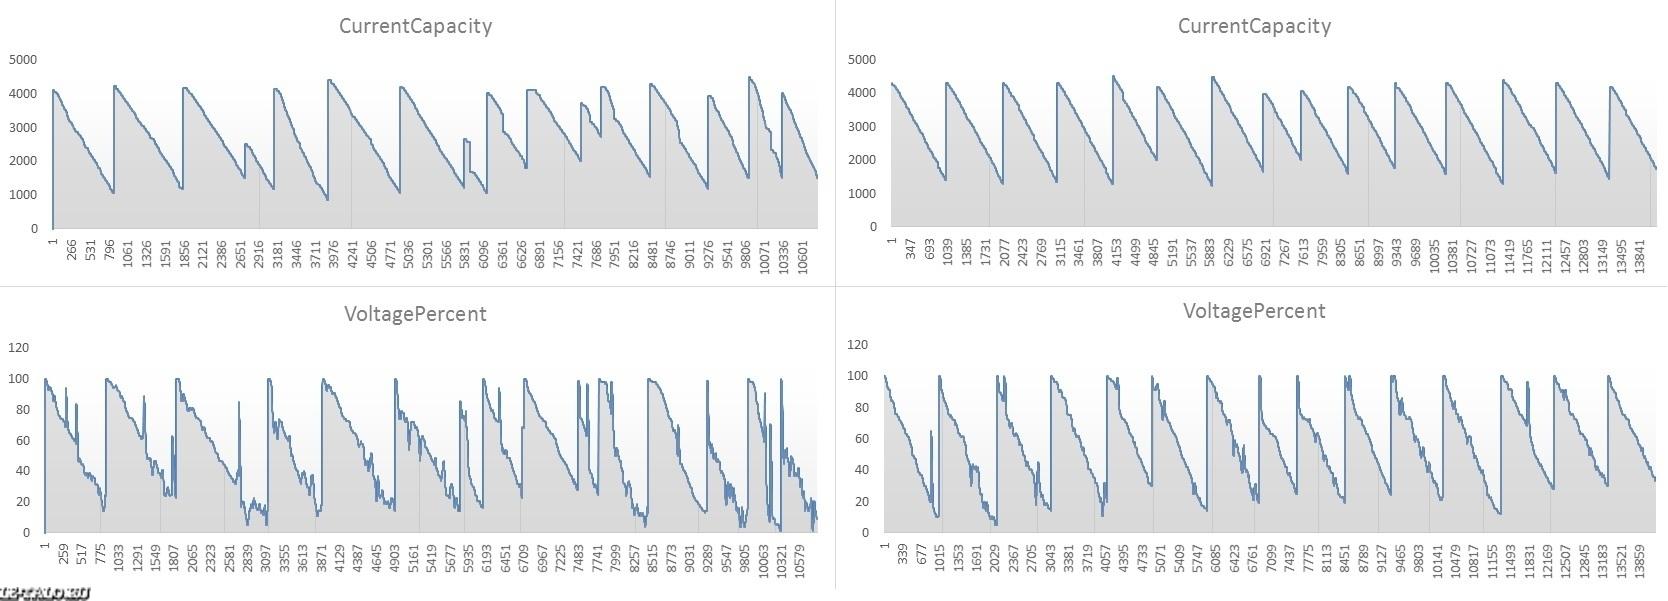 Battery dji сколько живут срок службы dji аккумулятор для phantom 3 standard